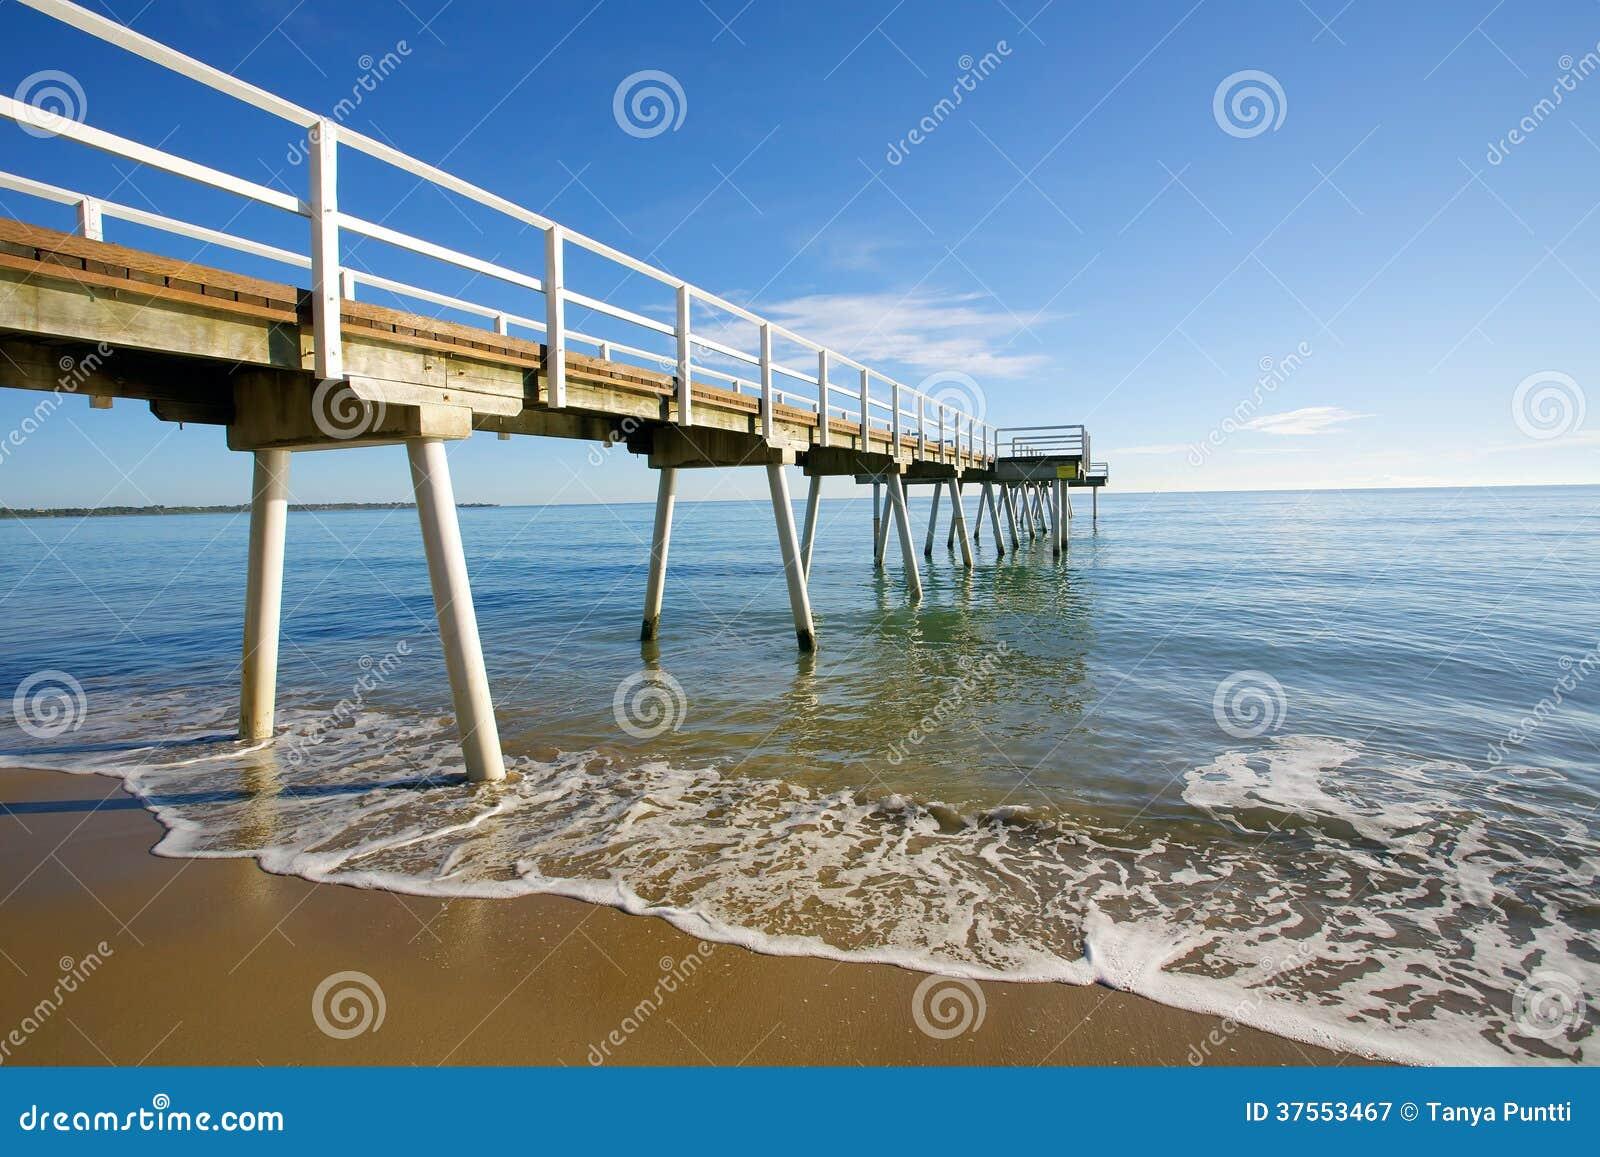 Hervey Bay Australia  city pictures gallery : Hervey Bay Australia Fotografia Stock Libera da Diritti Immagine ...